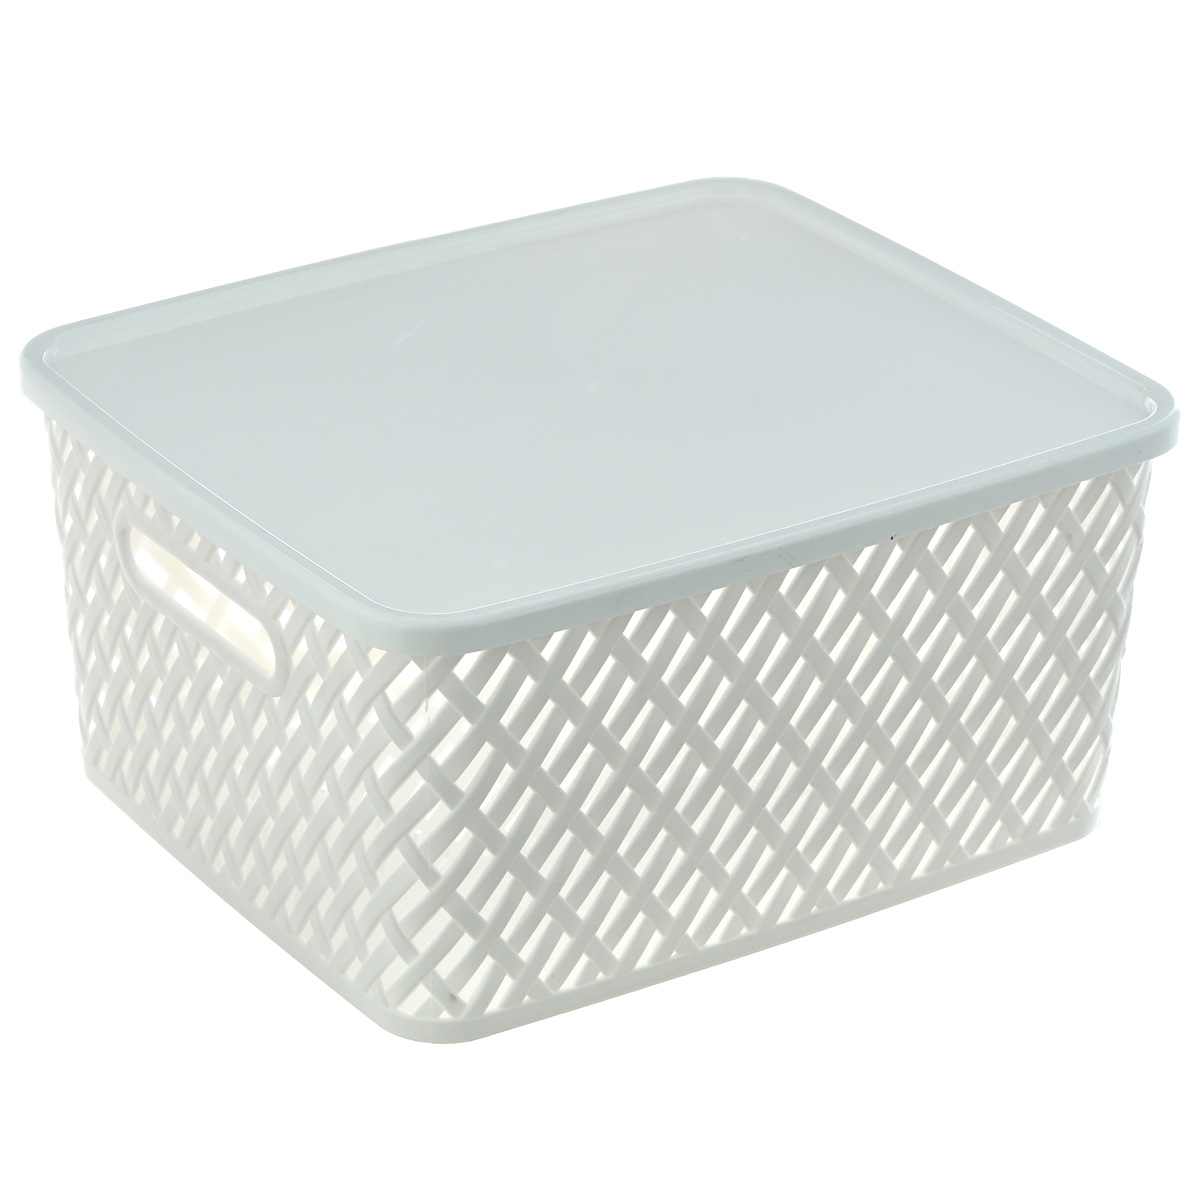 Корзина Альтернатива Плетенка, с крышкой, цвет: белый, 35 см х 29 см х 17,5 см ершик для туалета альтернатива плетенка белый